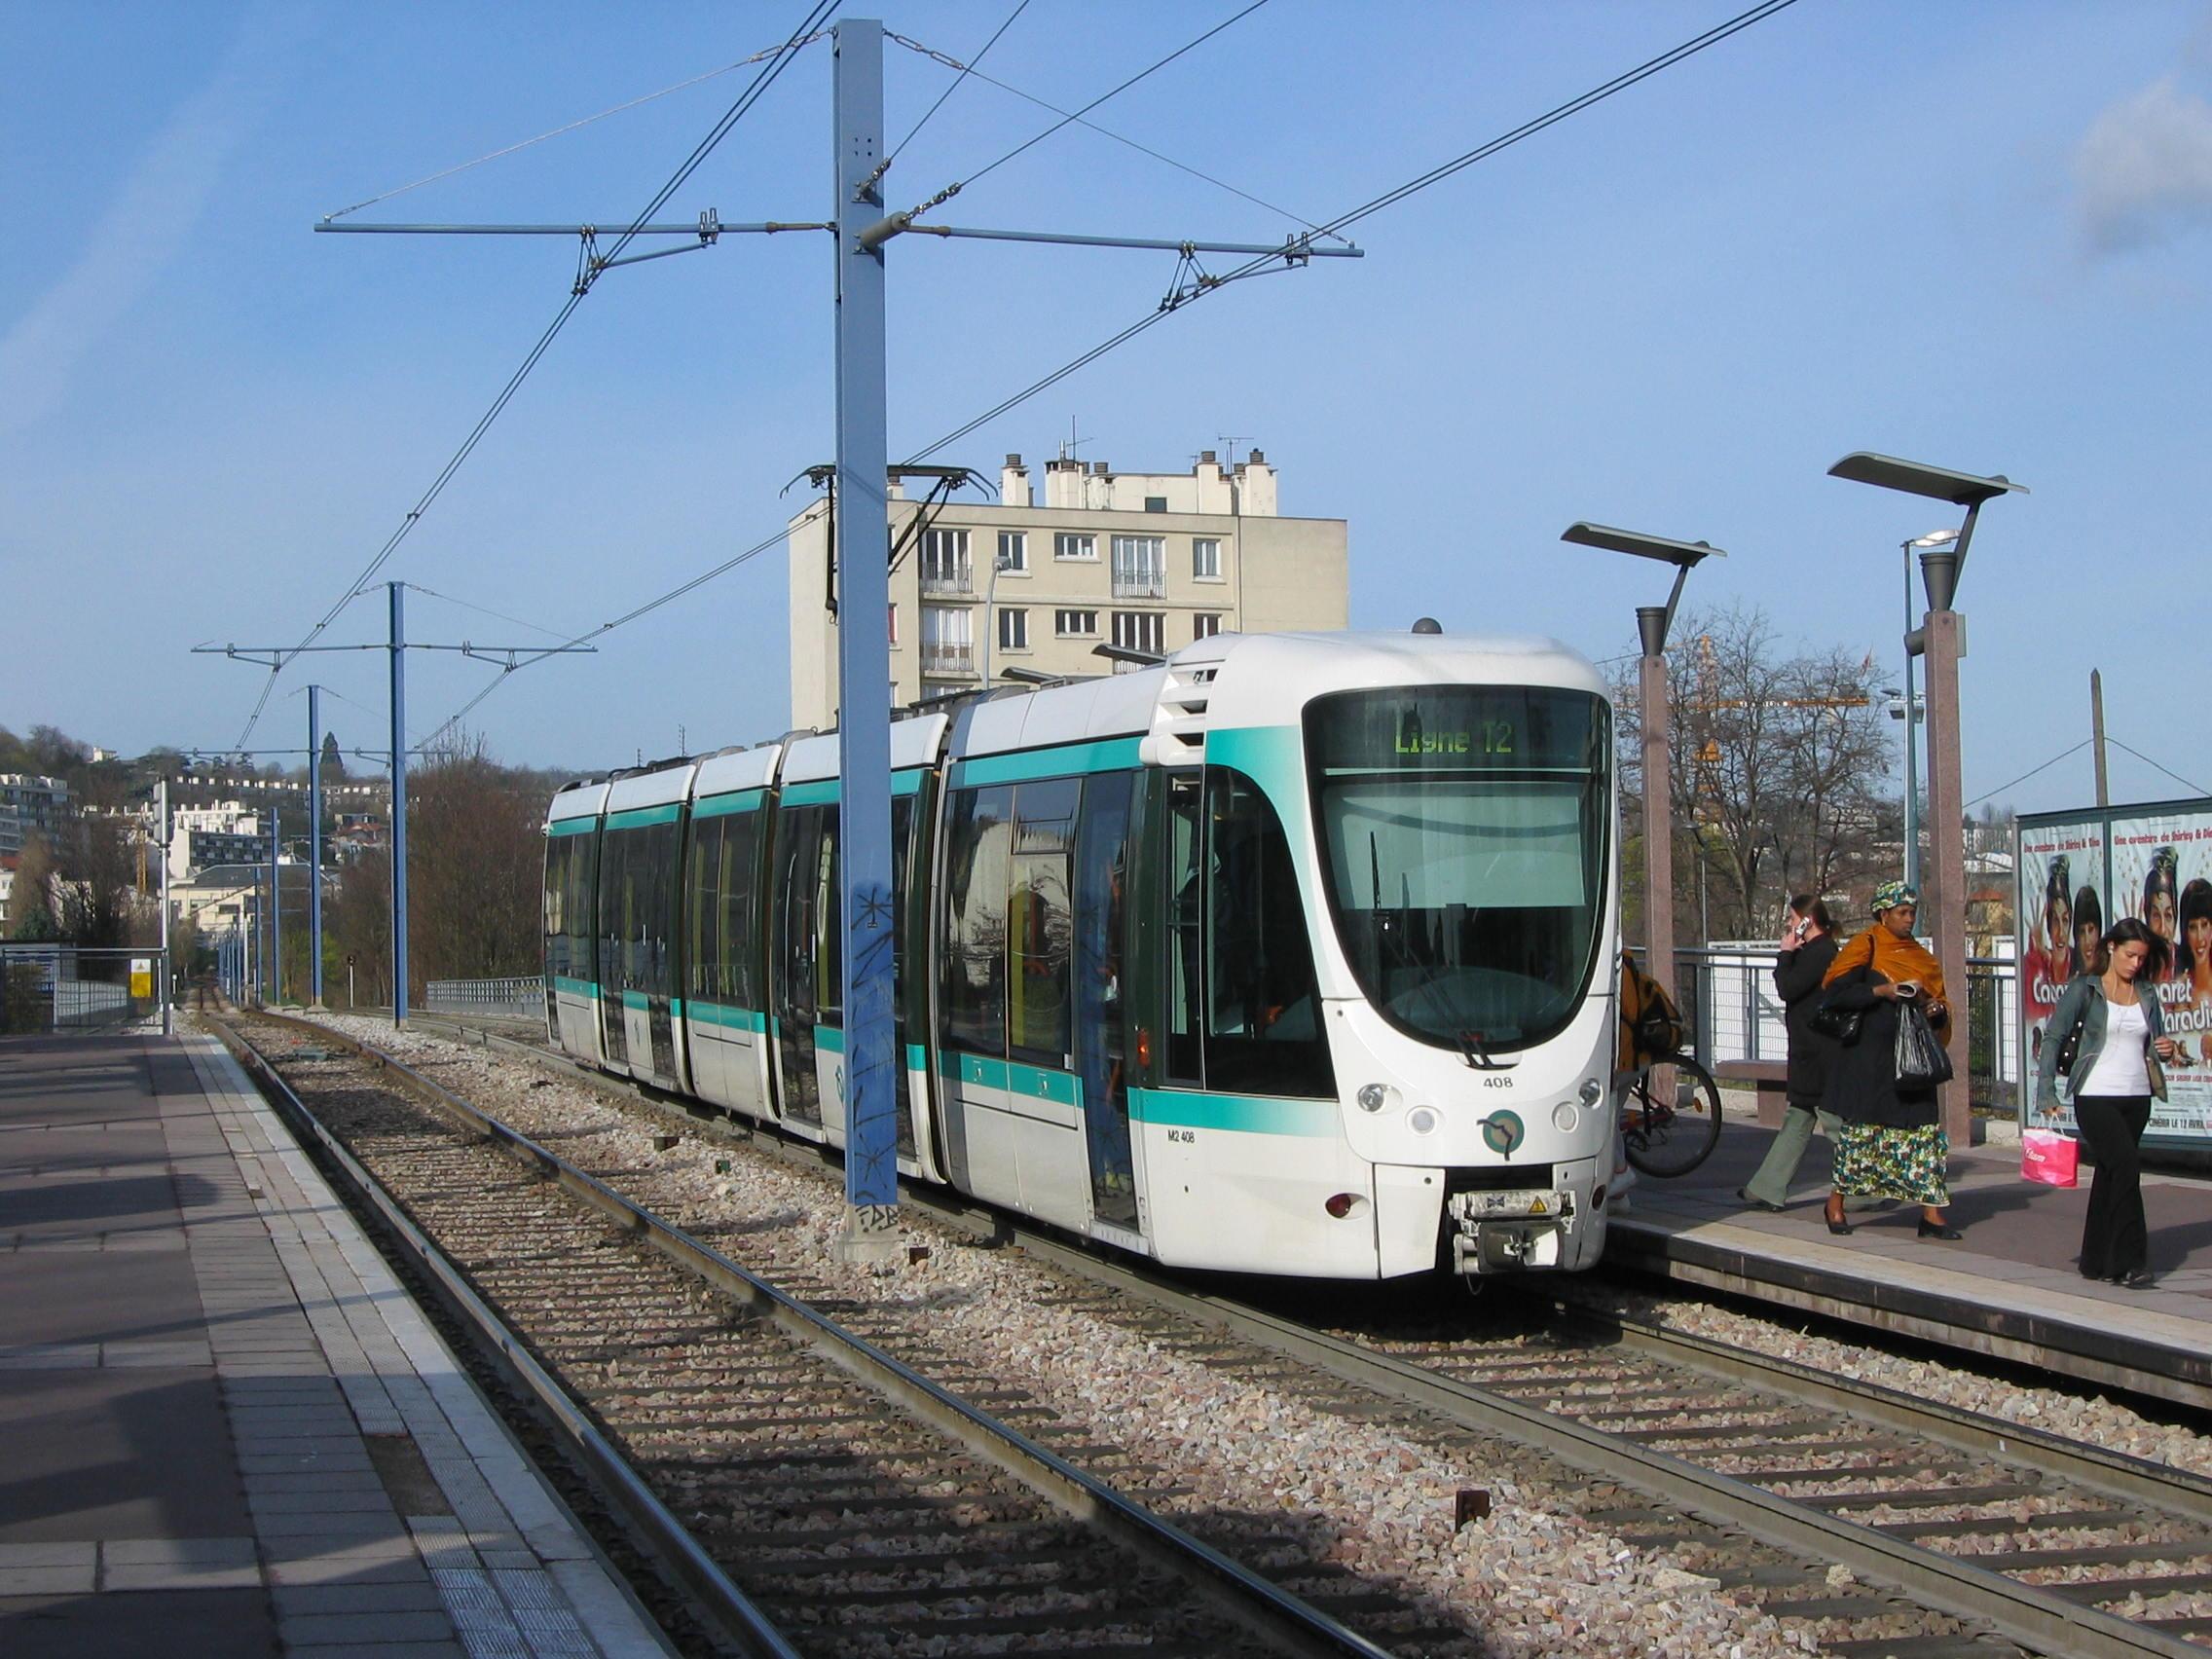 Tramway de paris - Trajet metro gare de lyon porte de versailles ...